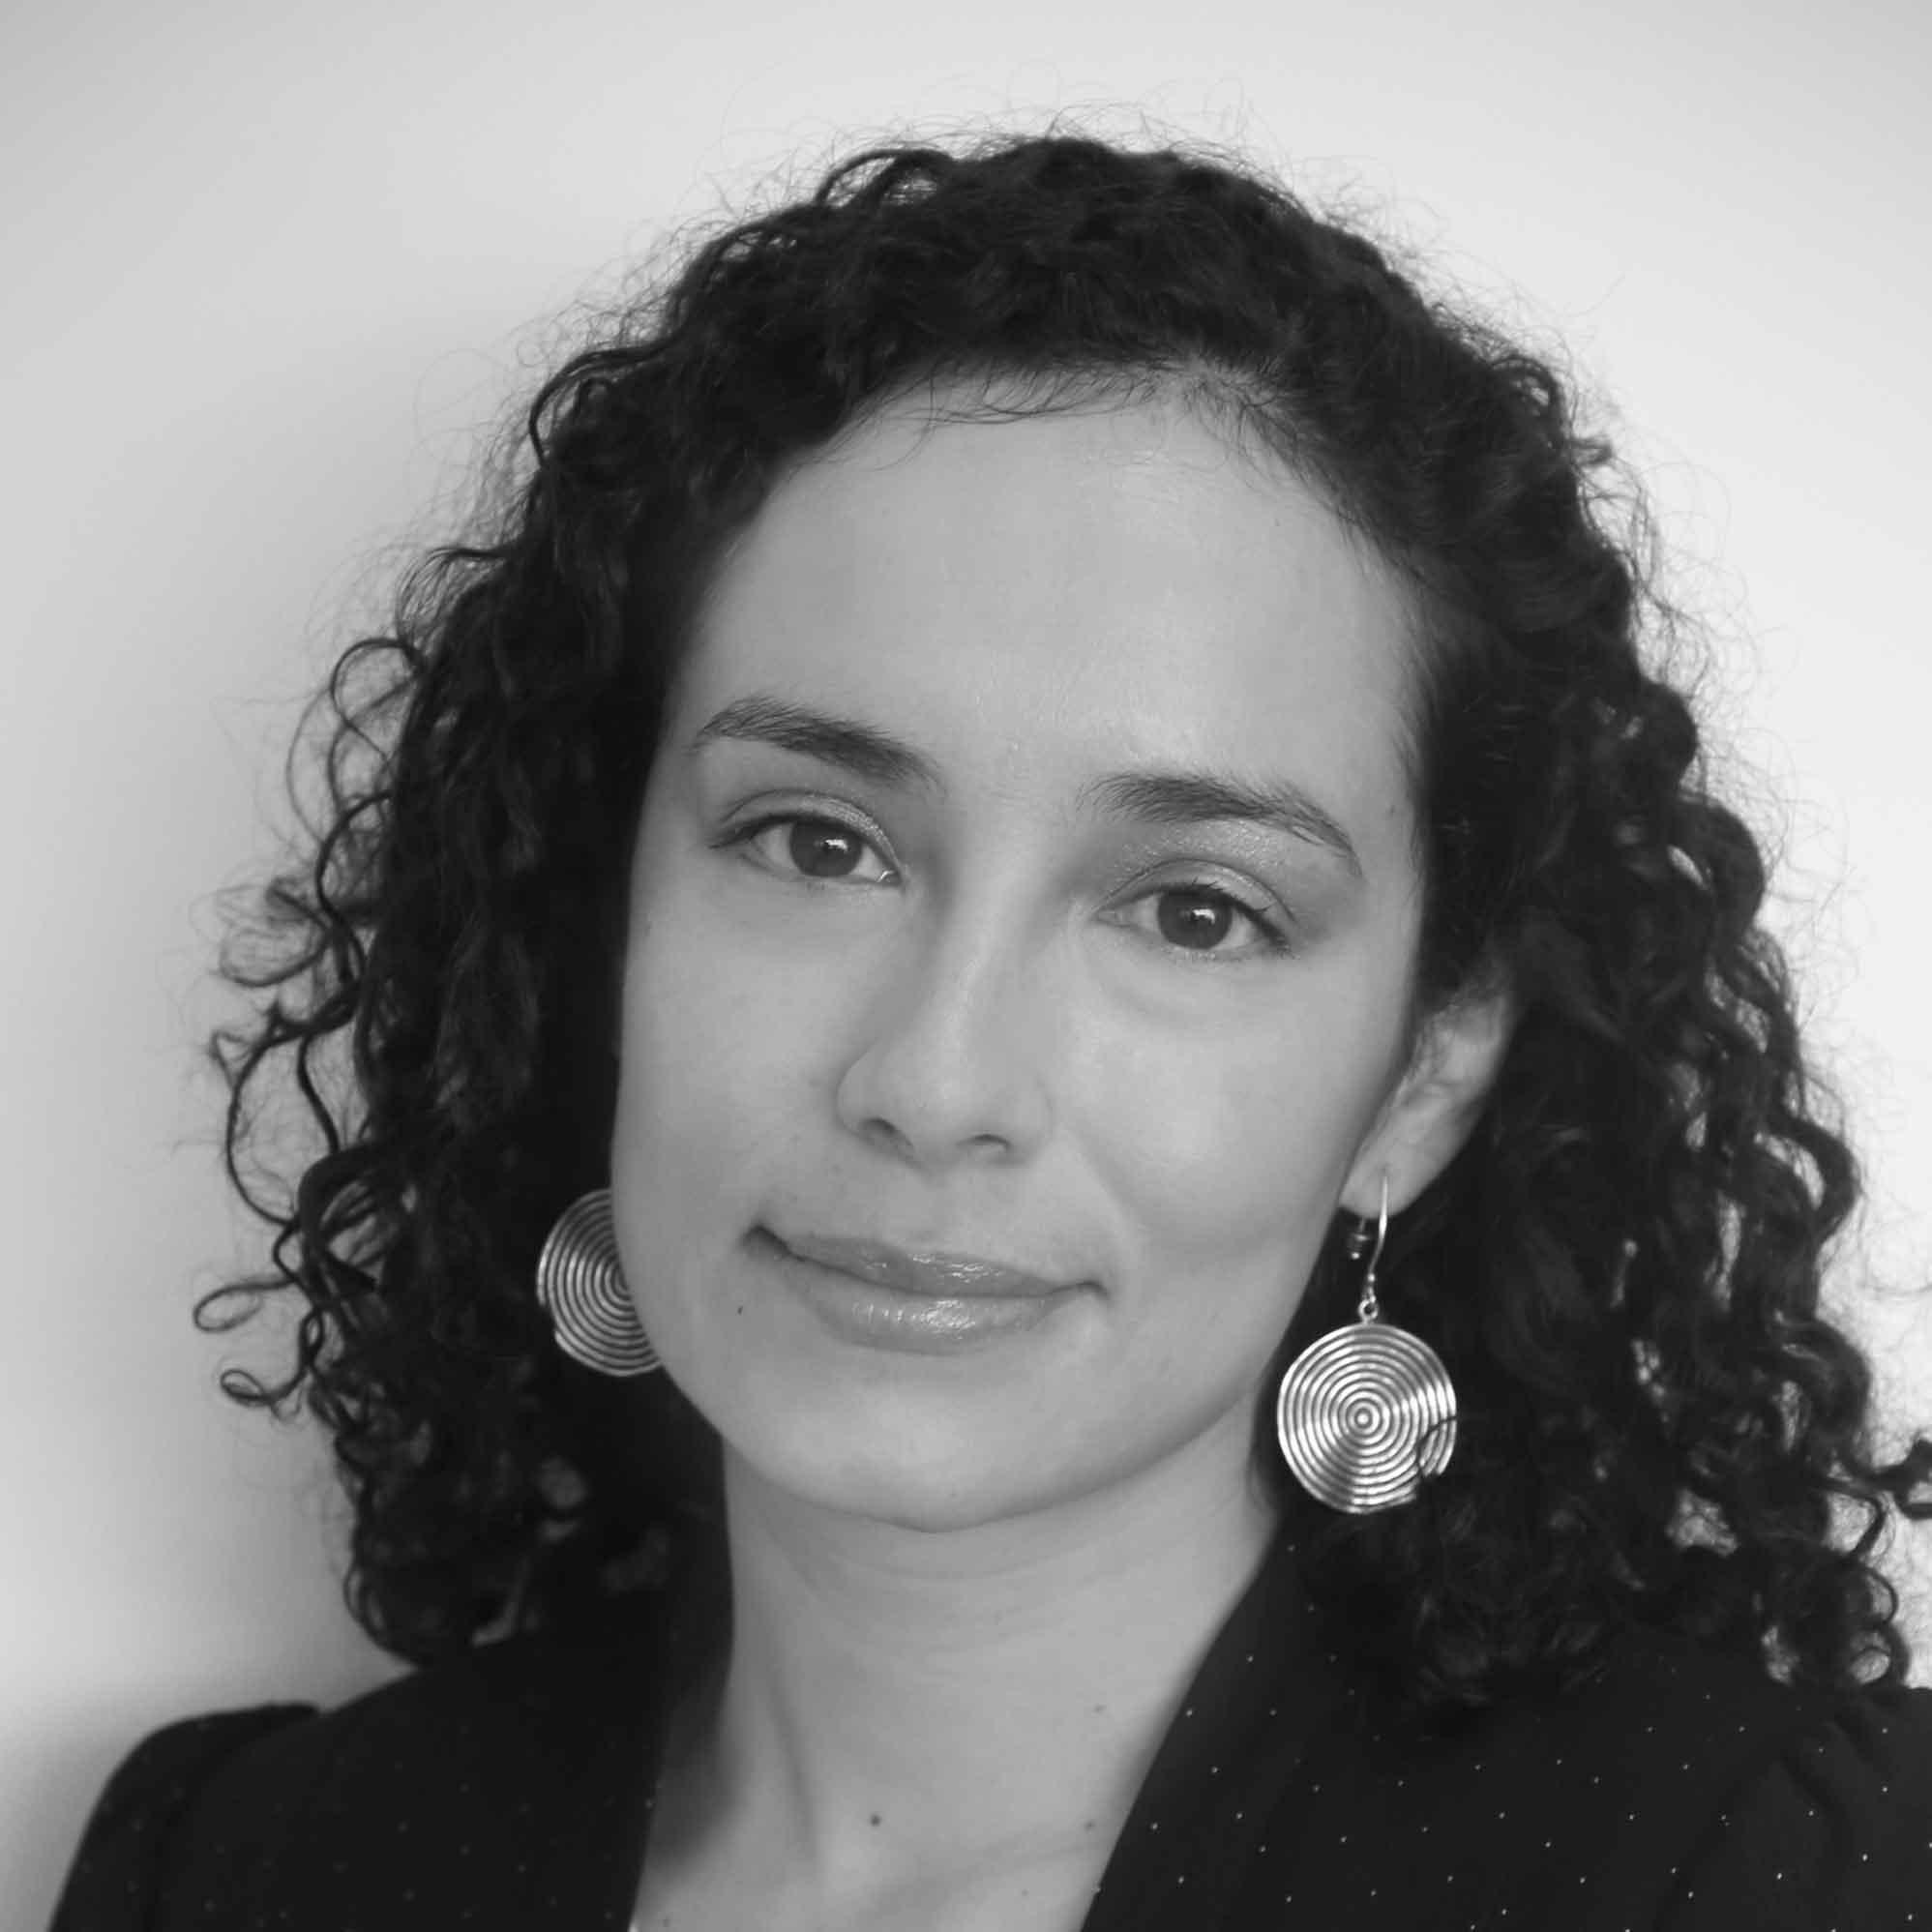 Diana-Agudero-Barrios